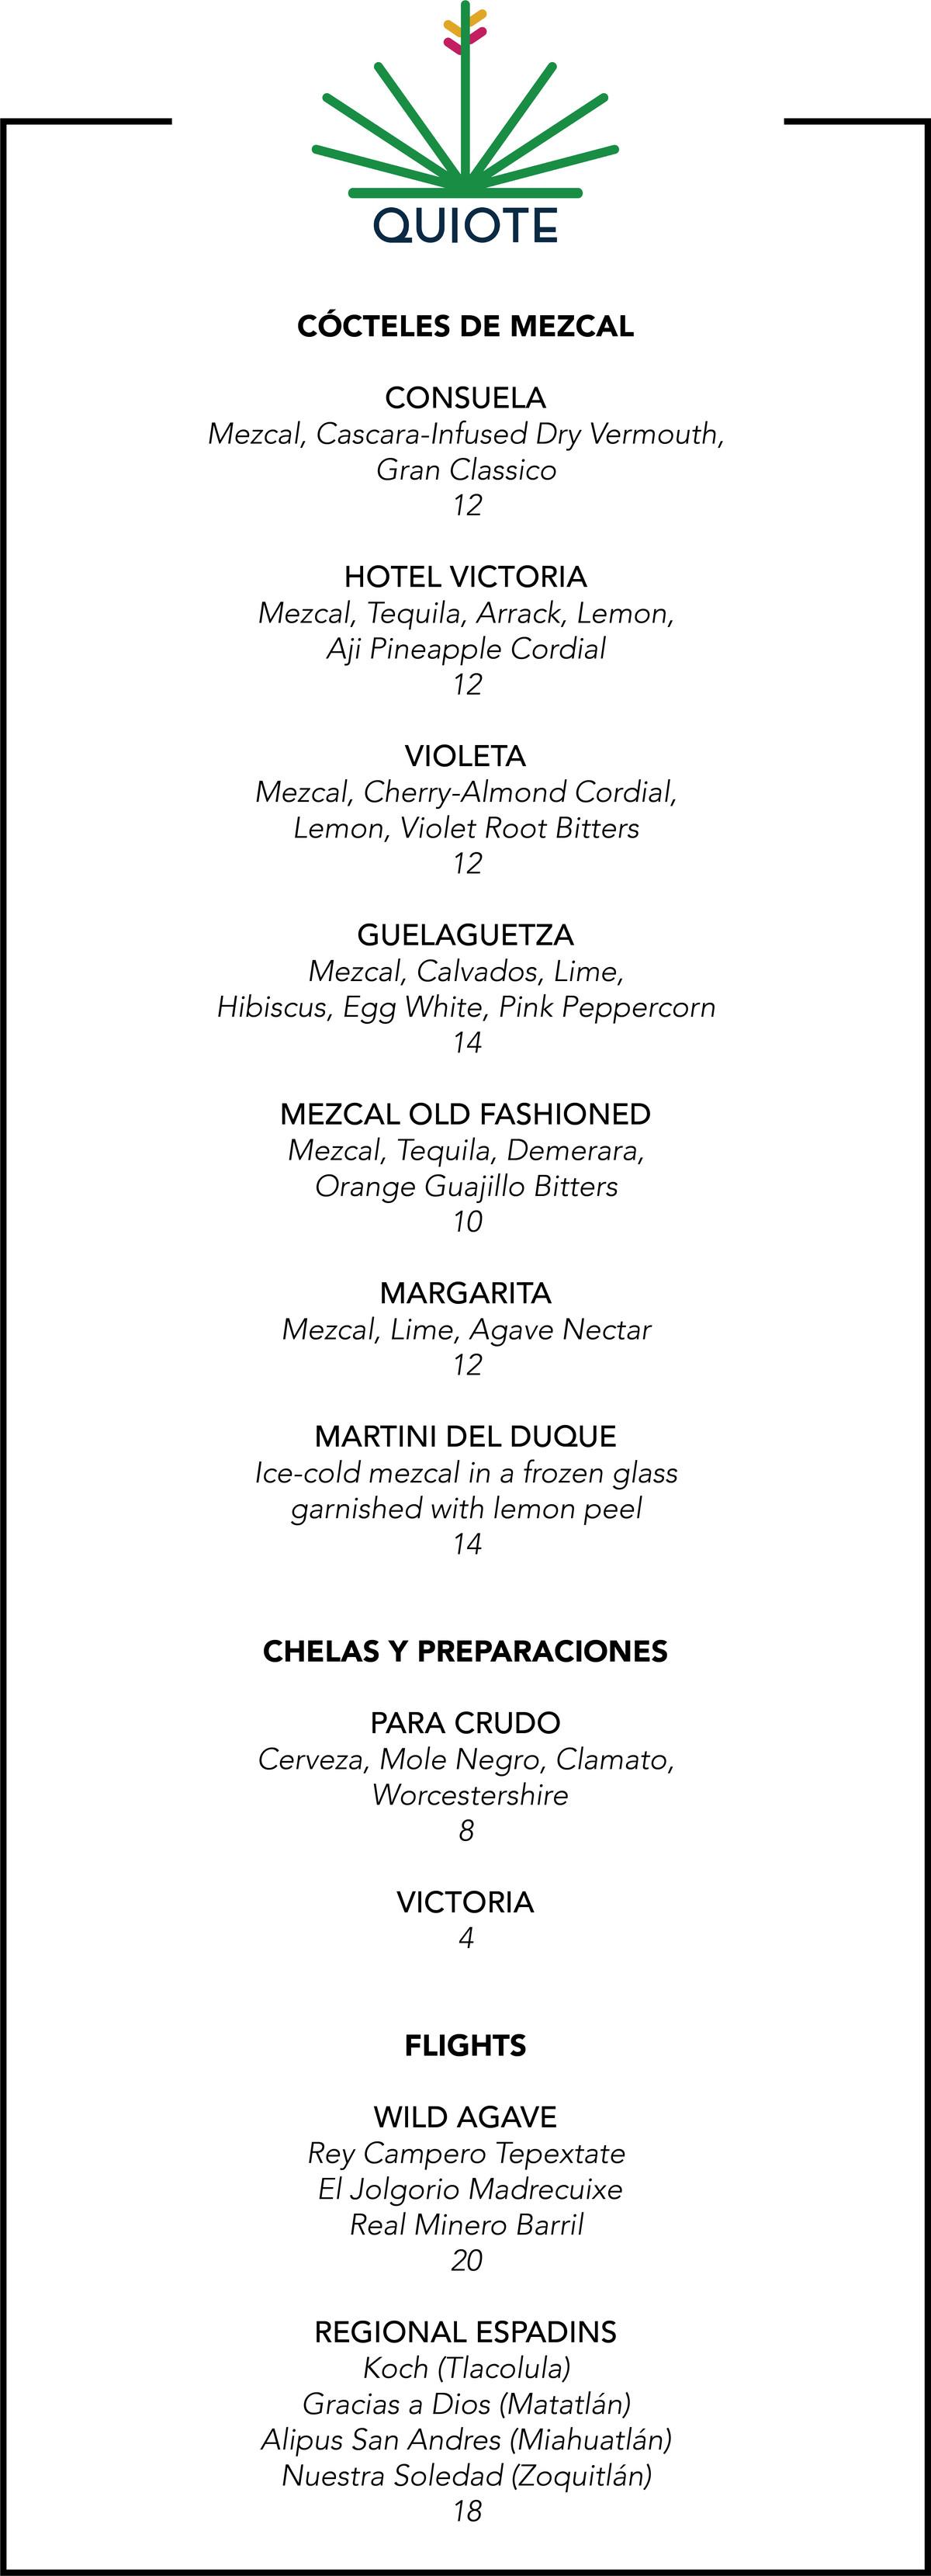 Logan Square's Quiote Opens Mezcal Bar Featuring Mexican